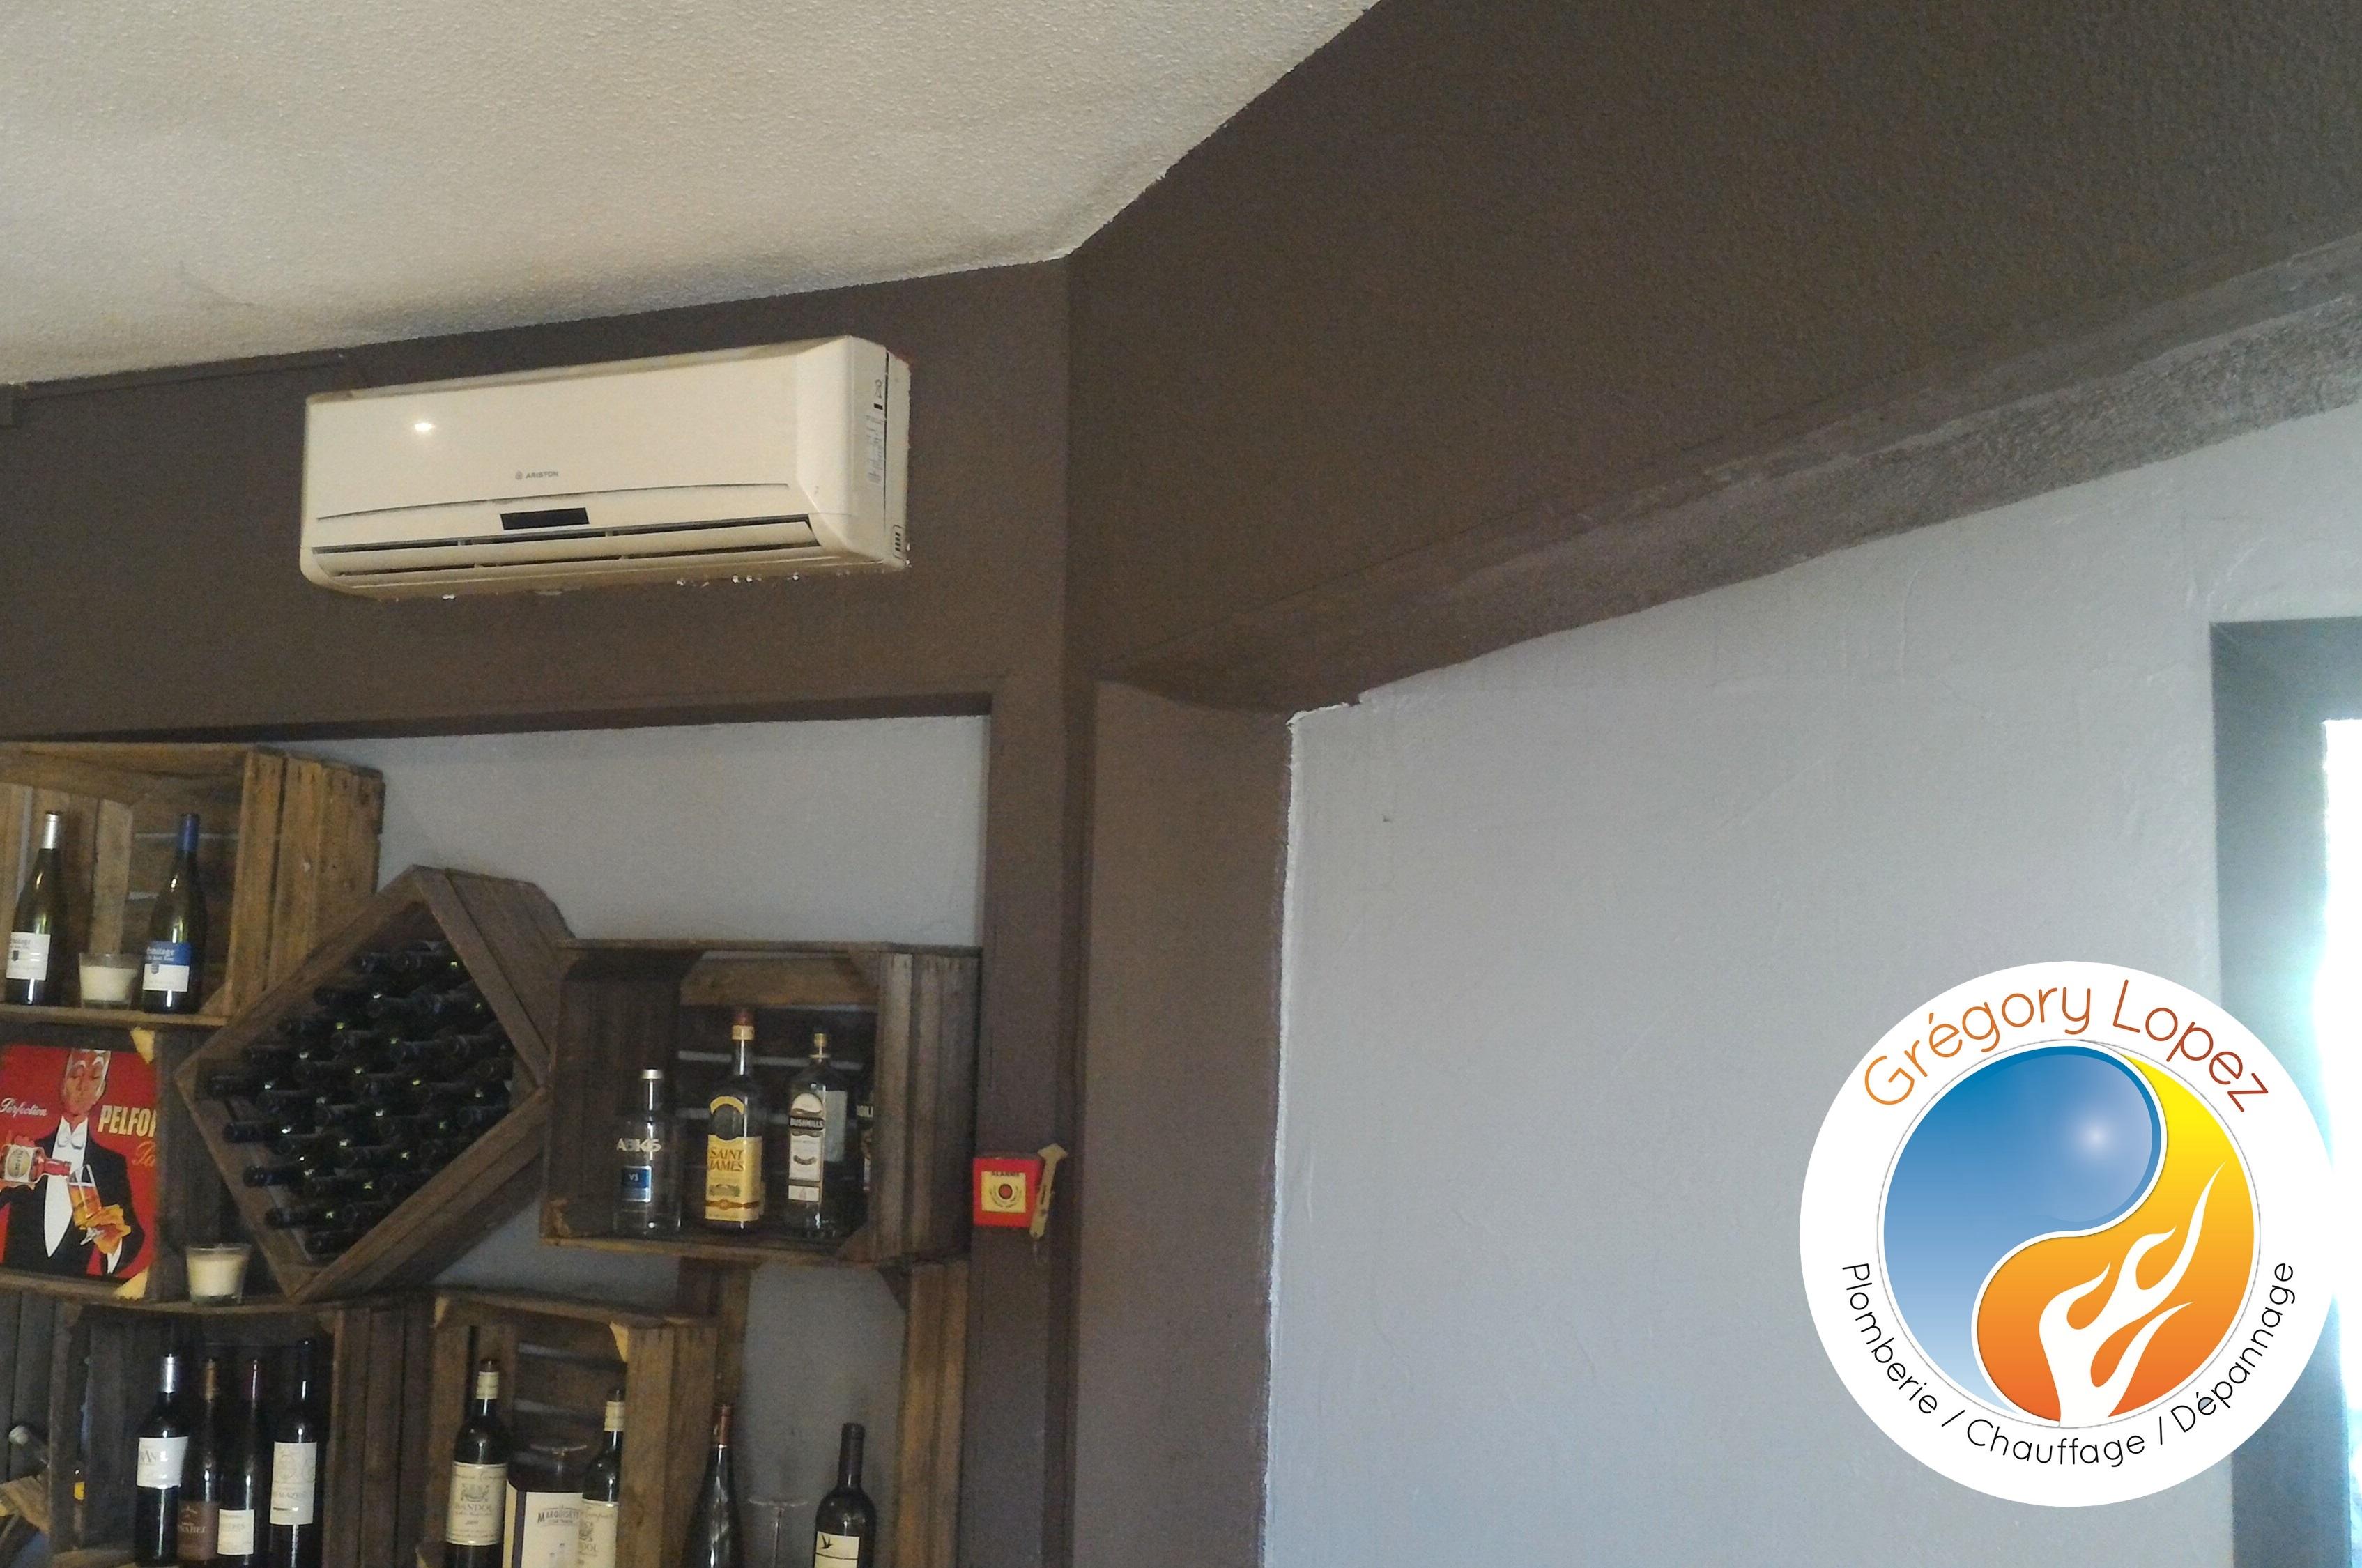 climatisation h rault ets gr gory lopez plombier chauffagiste 06 95 56 31 89. Black Bedroom Furniture Sets. Home Design Ideas